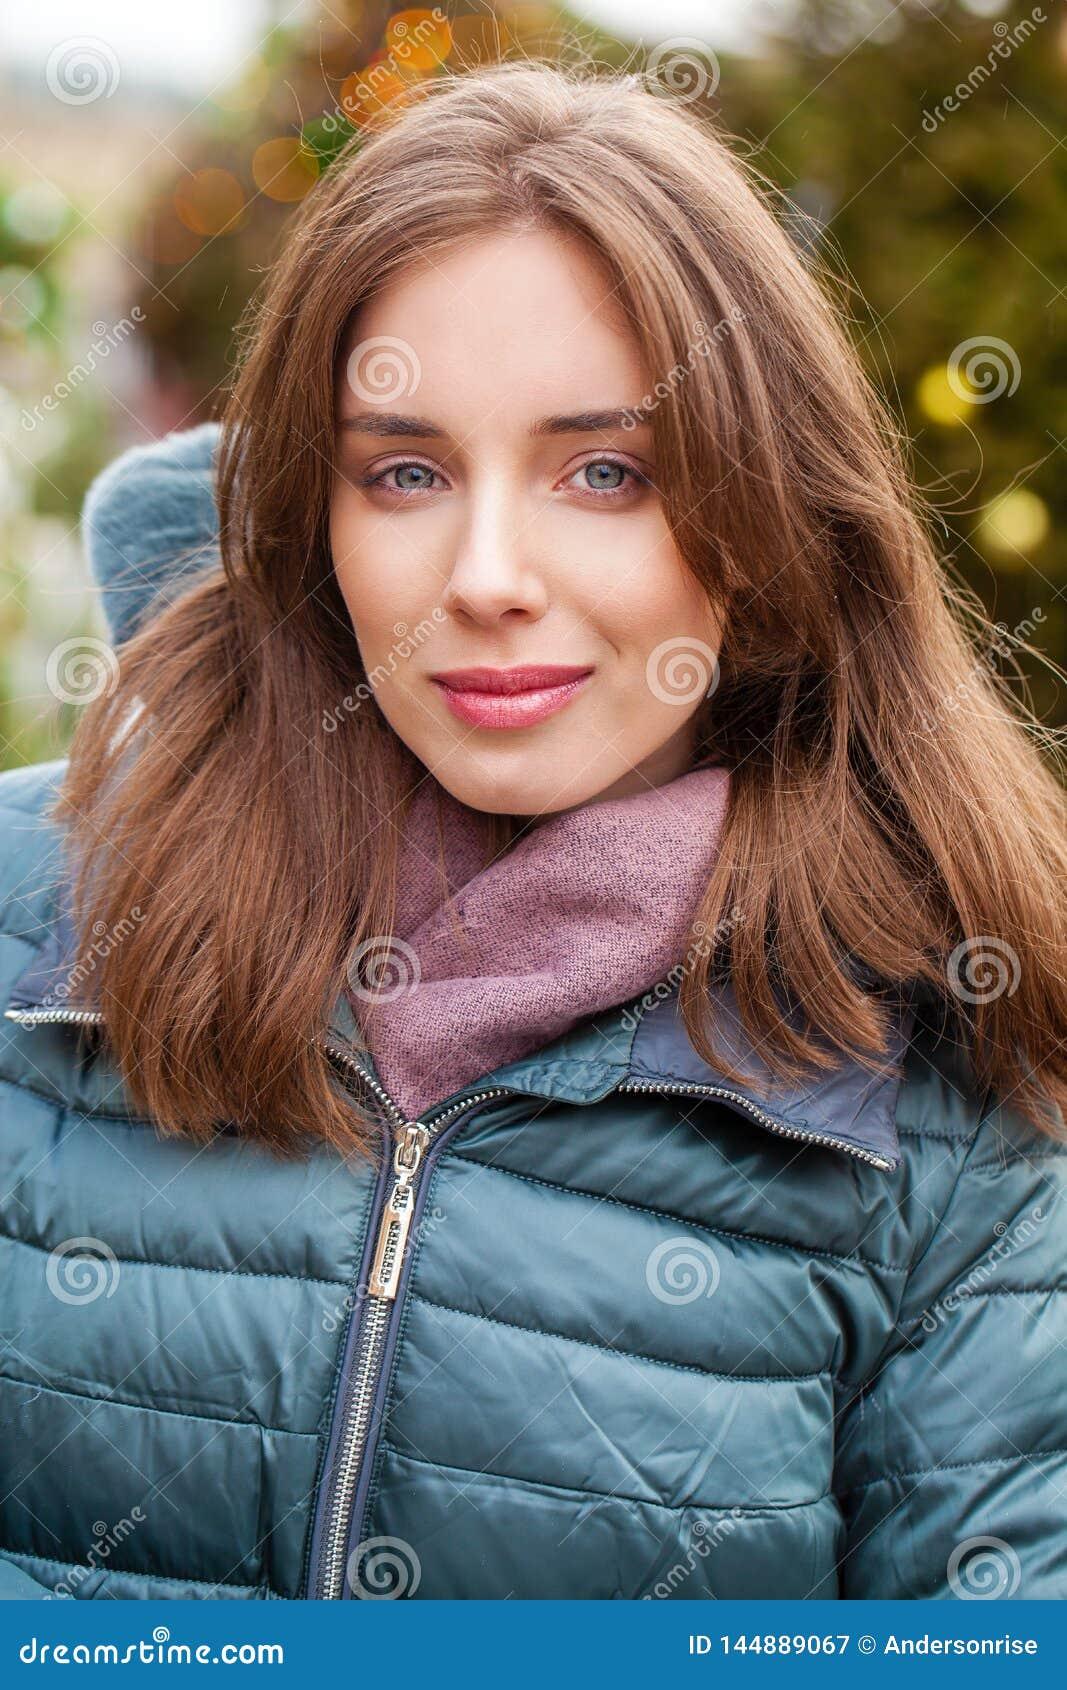 Closeupst?ende av en ung kvinna i vintern ner omslaget